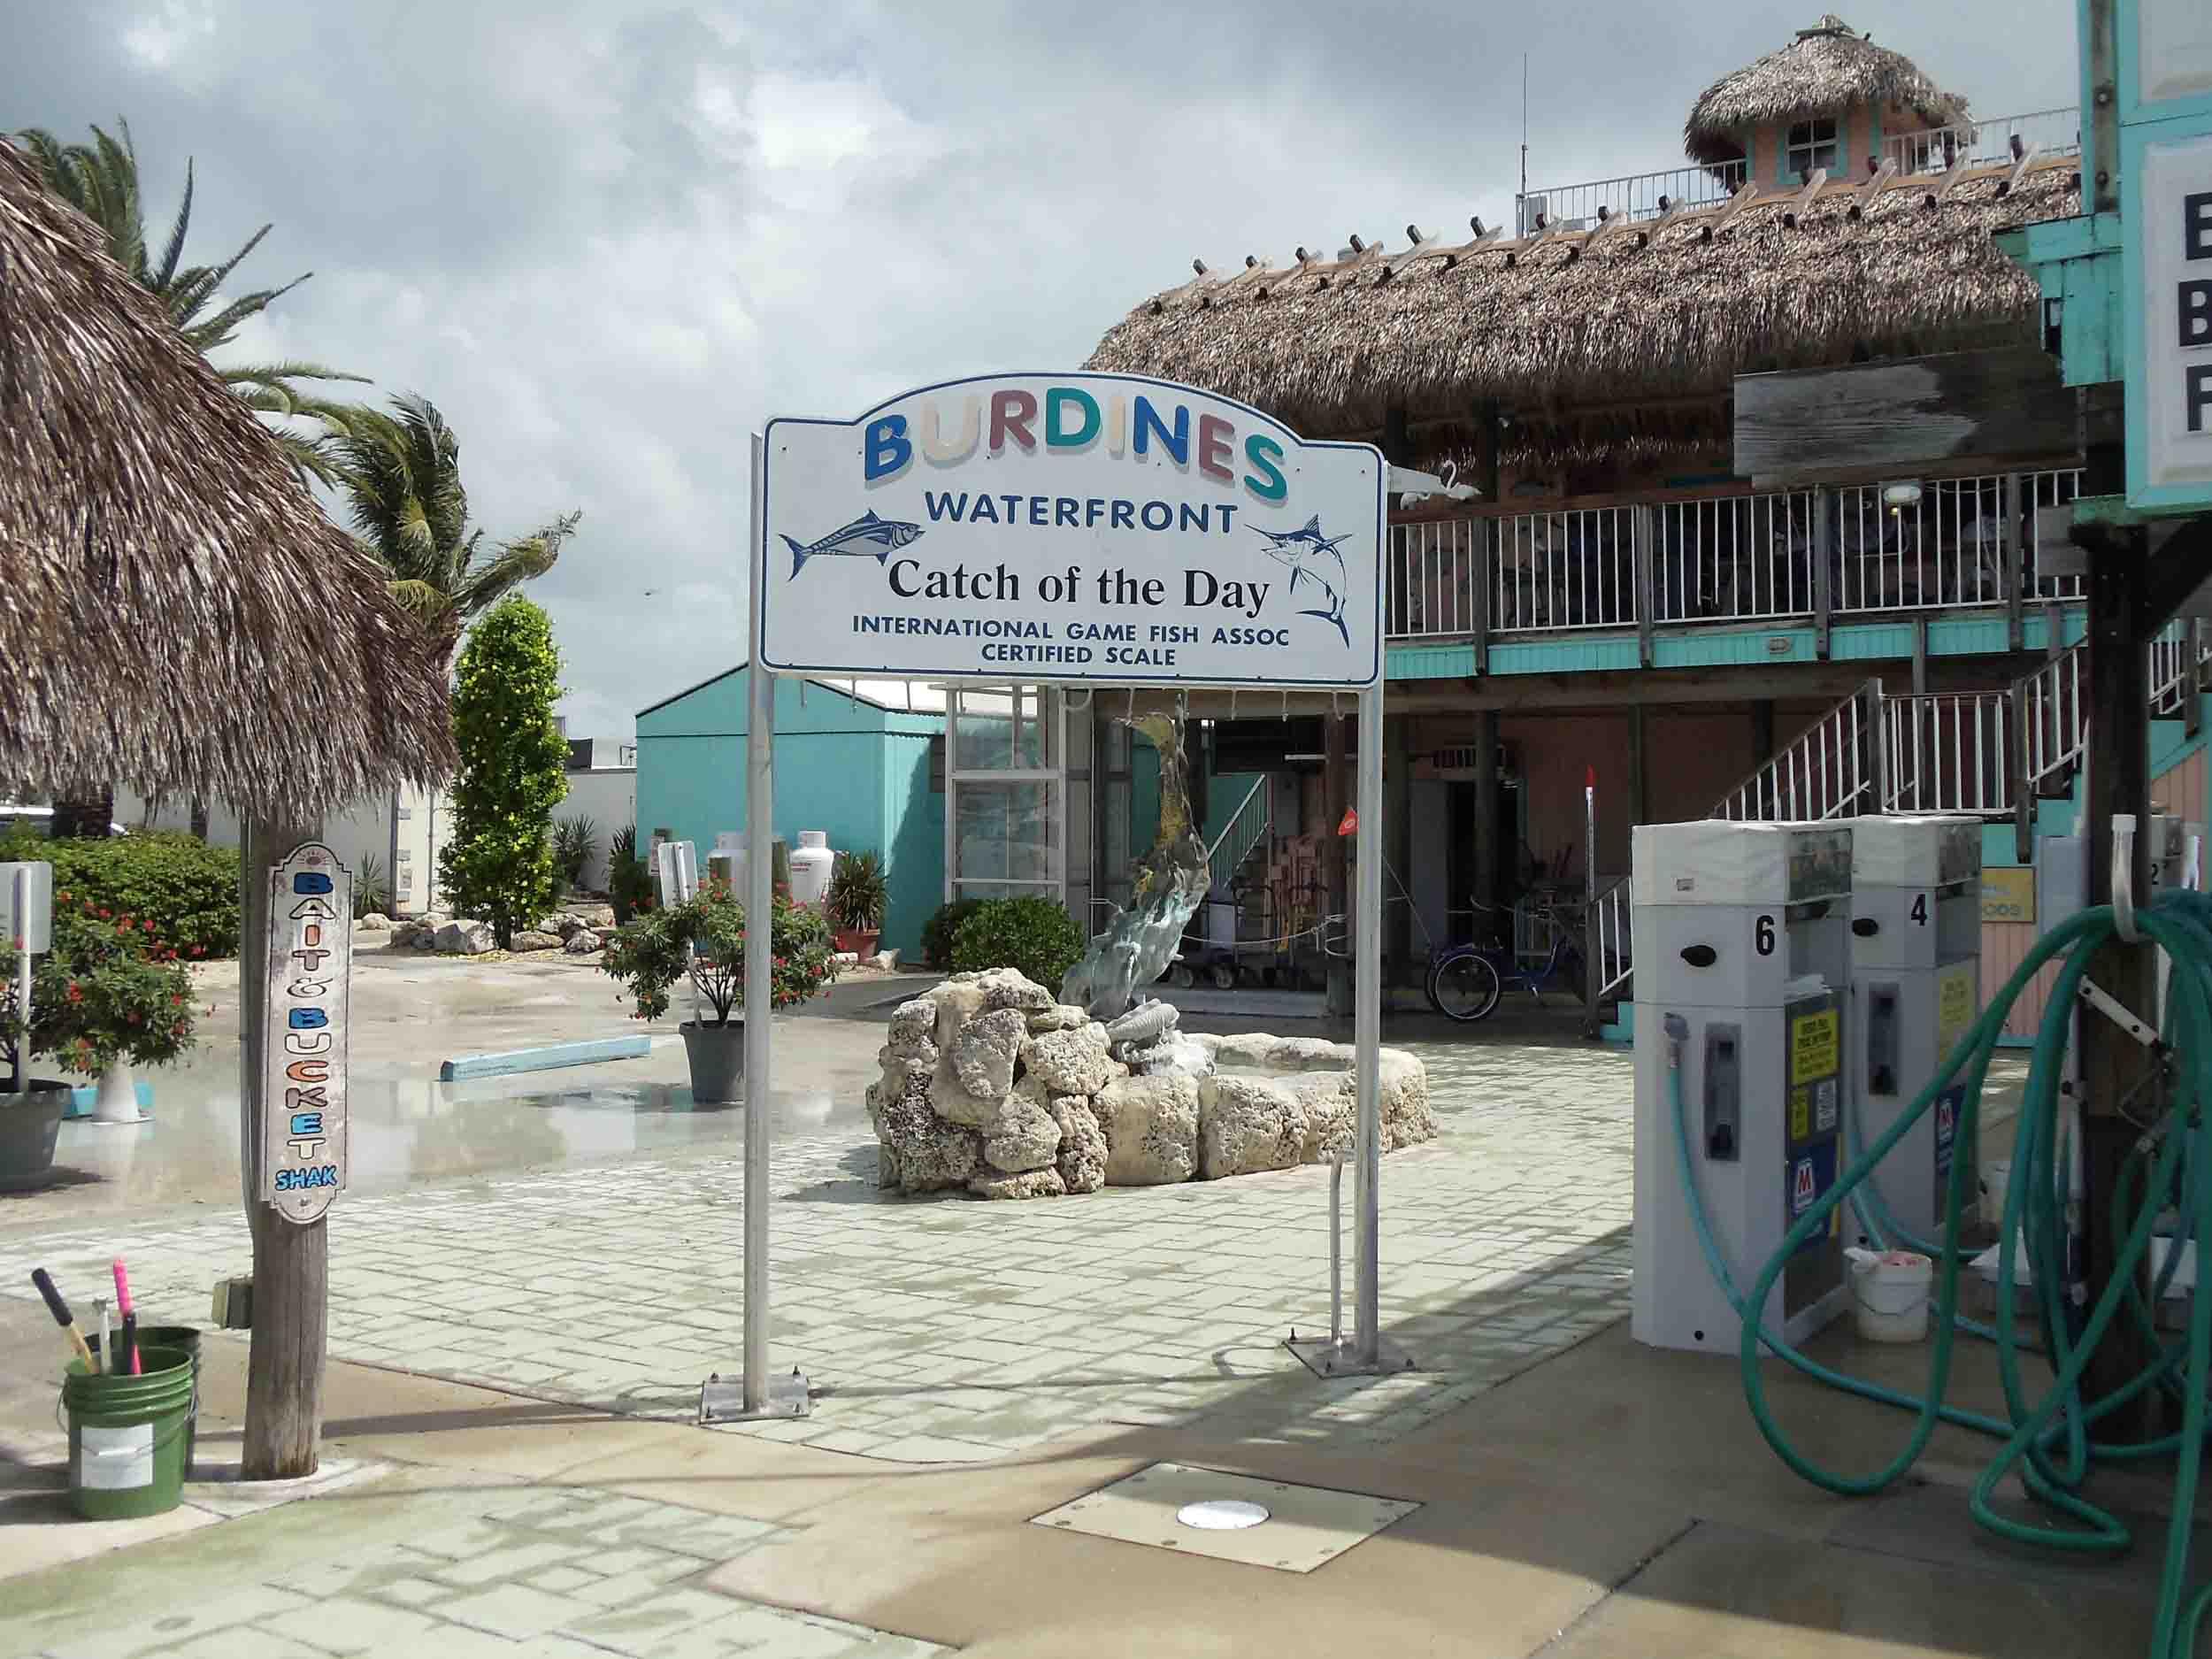 Burdines Waterfront ChikiTiki Bar Entrance